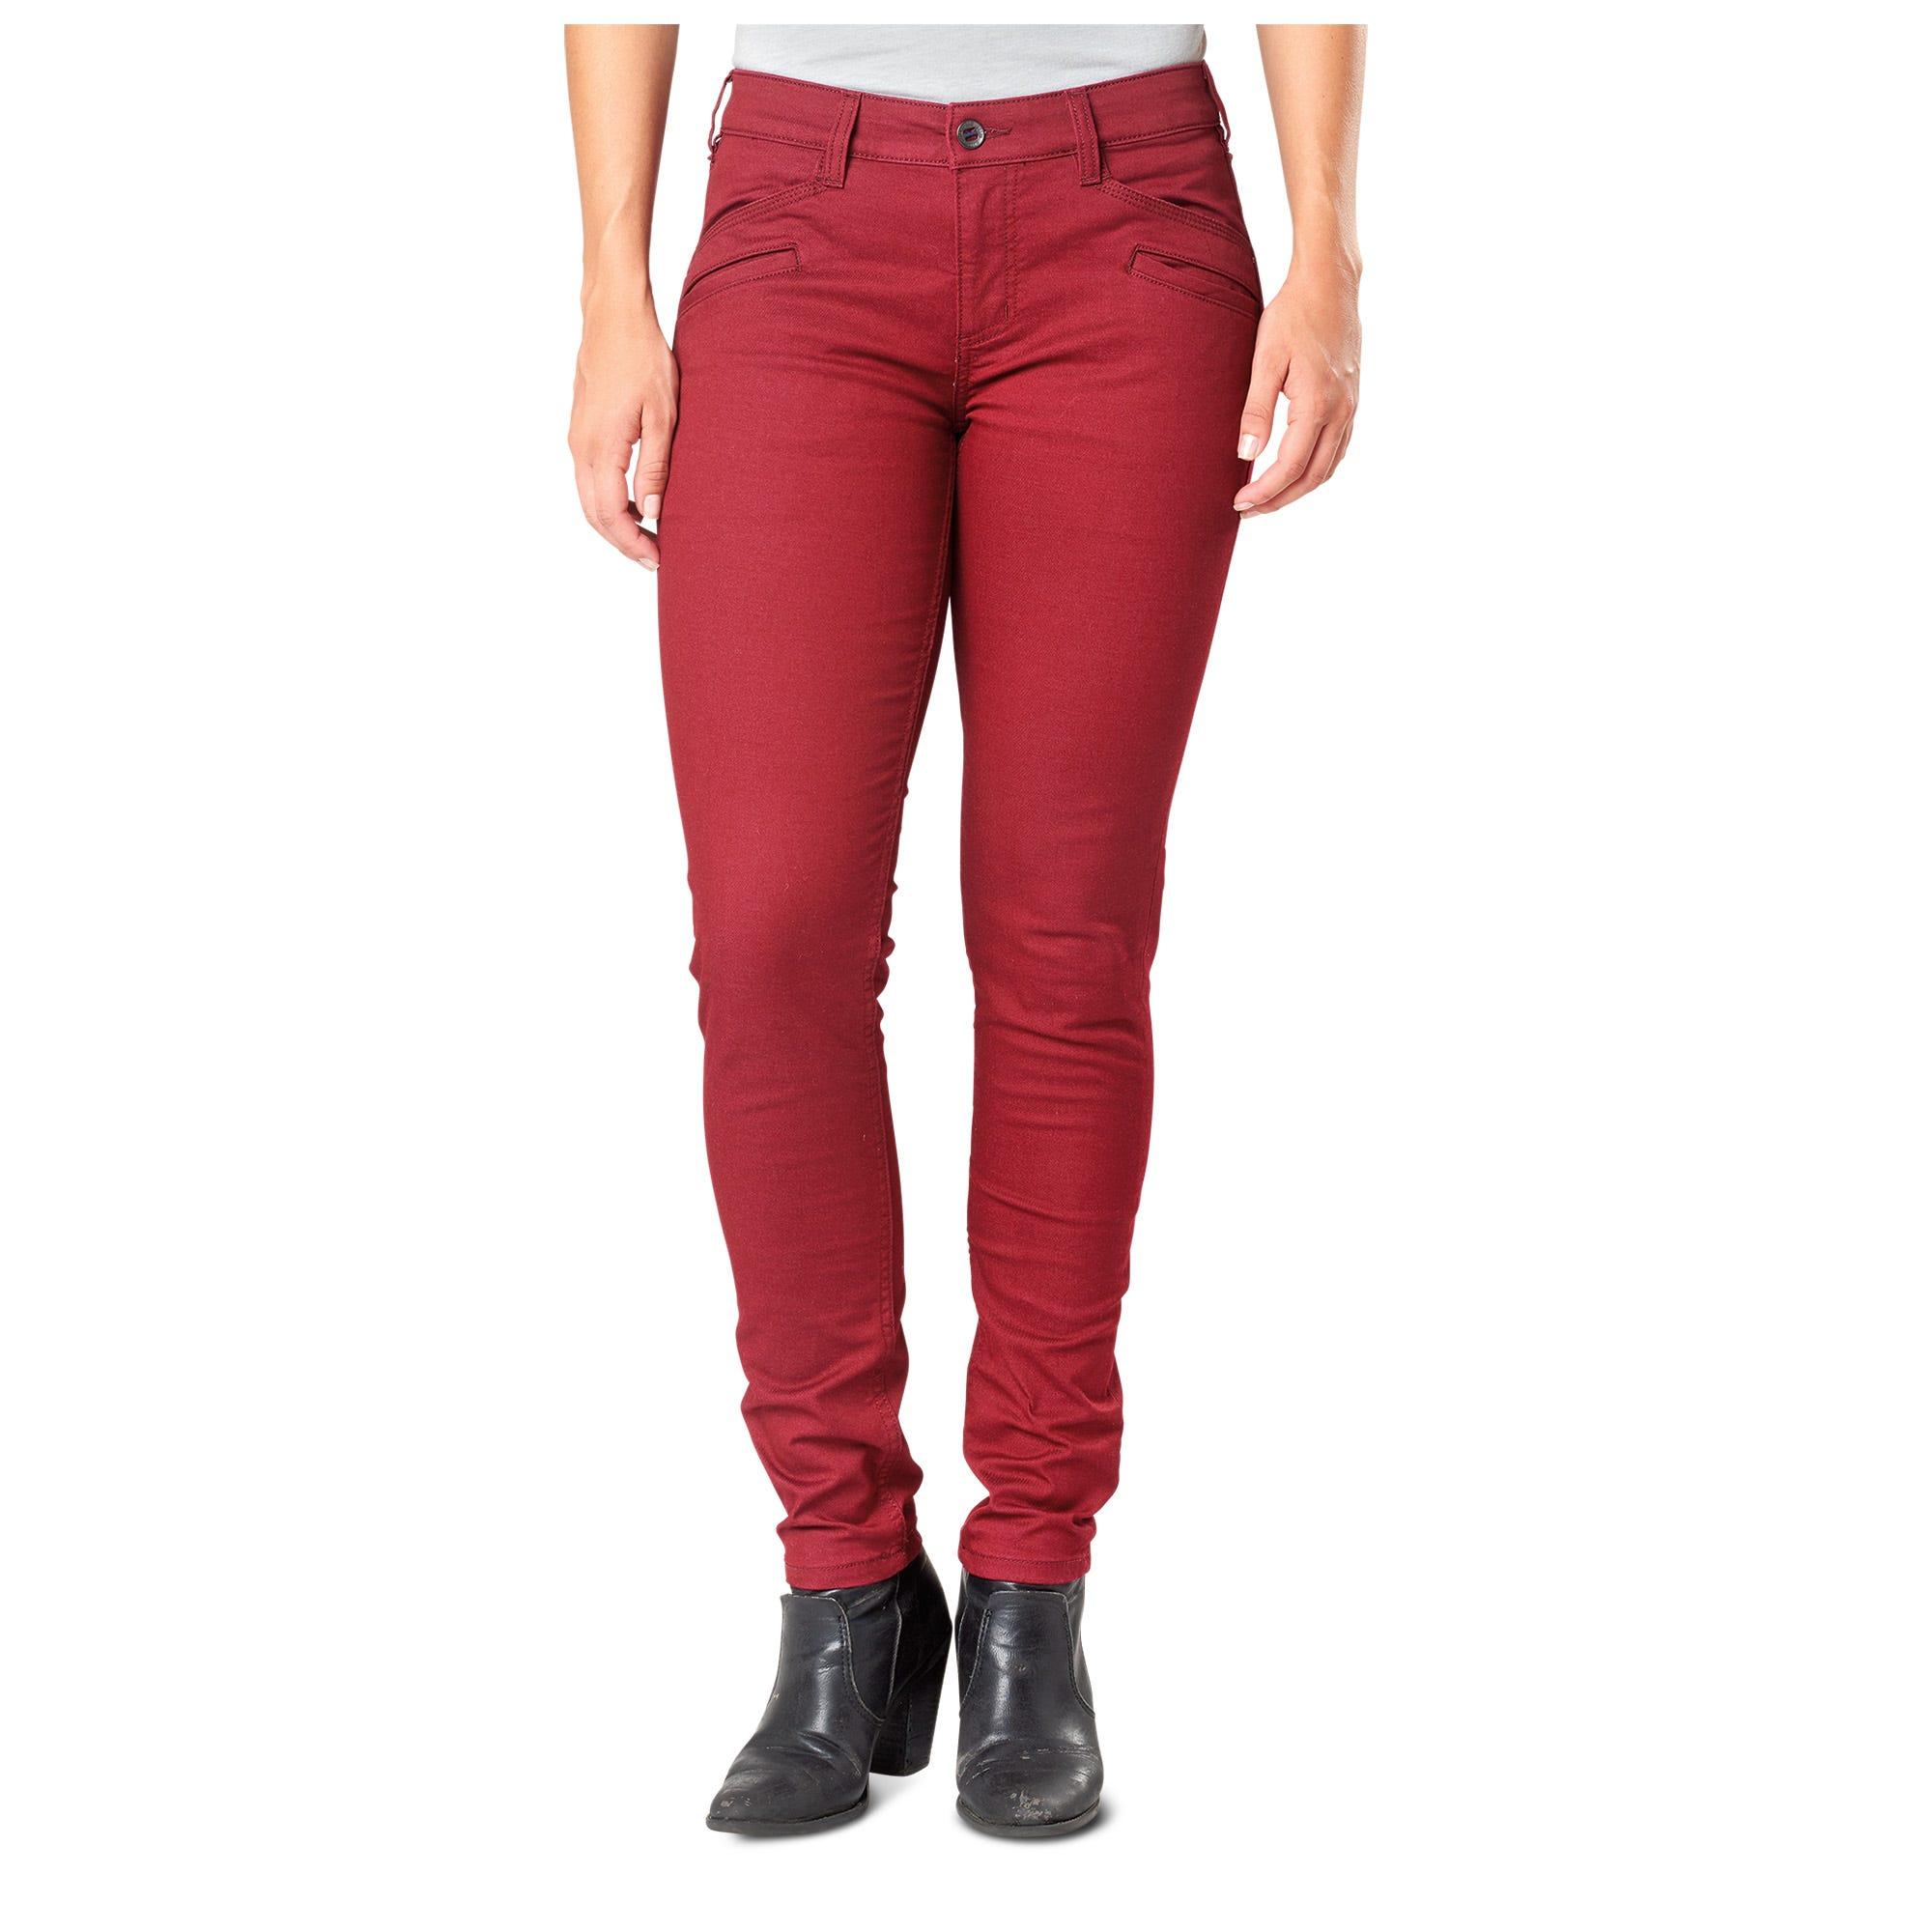 5.11 Tactical Women's Defender-Flex Slim Pant (Red)